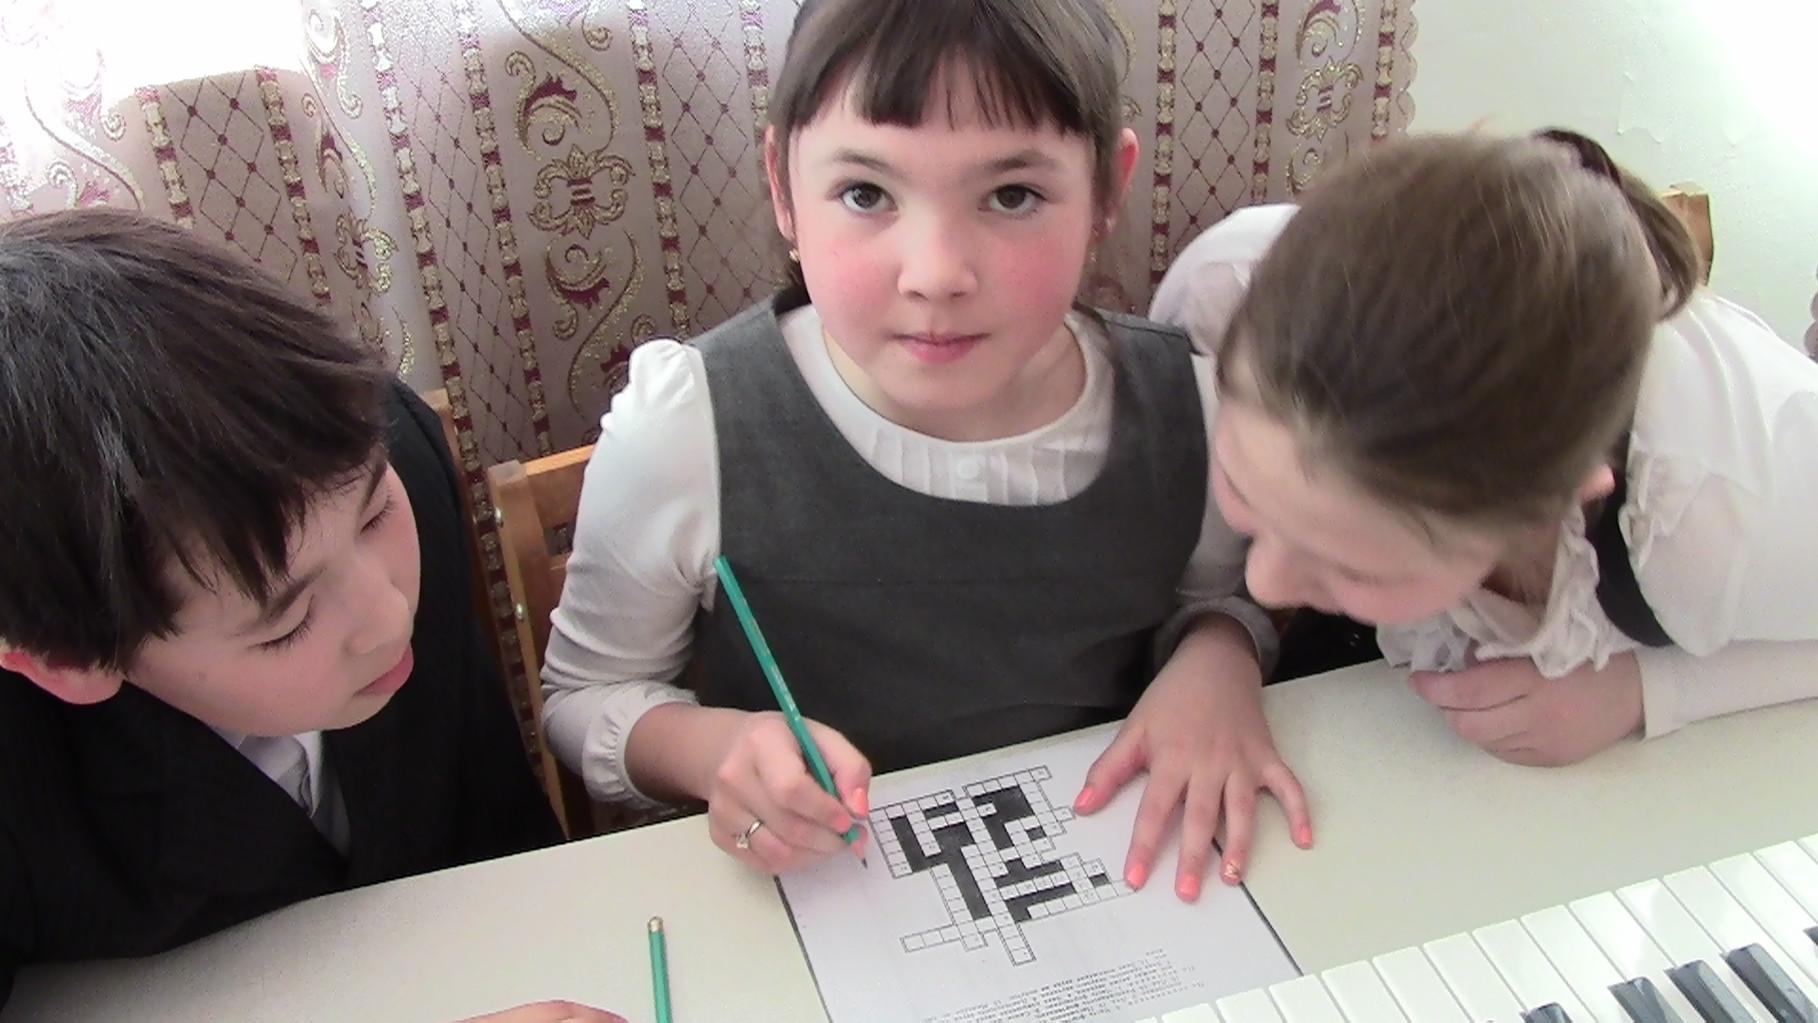 Команда №2: Хакимов М., Кравцева Д., Матерухина Д.